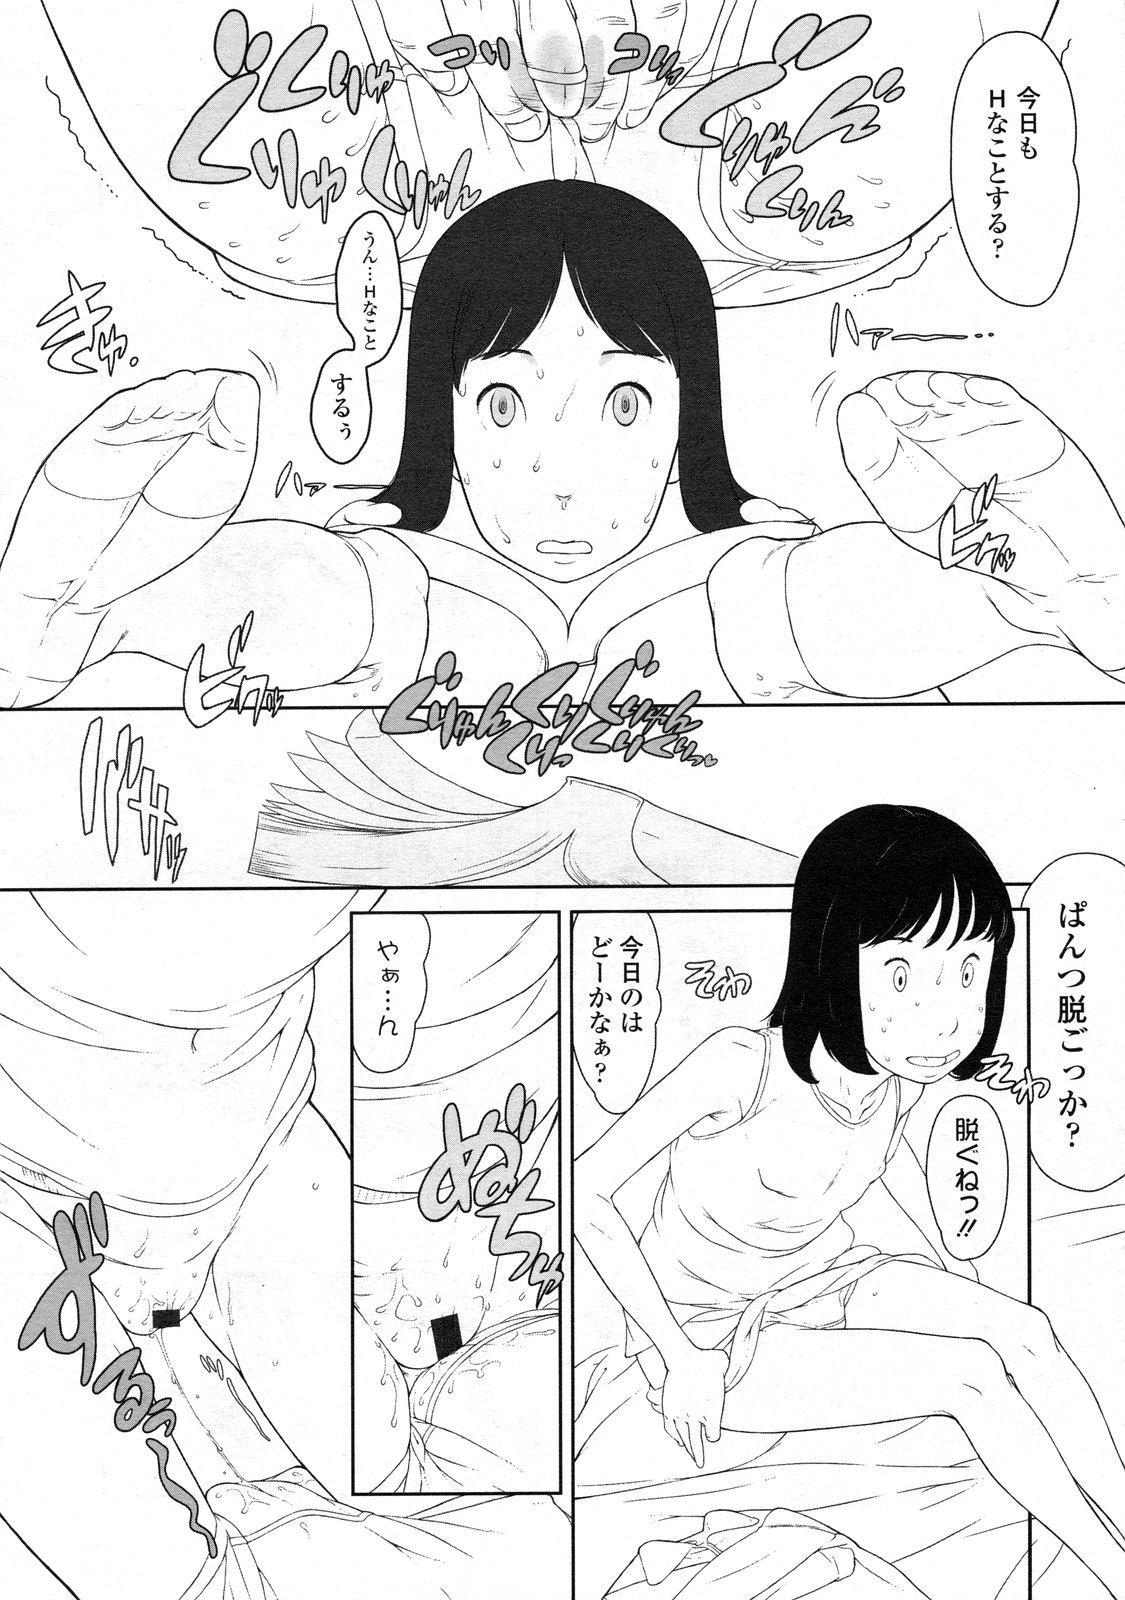 COMIC LO 2009-09 Vol. 66 54